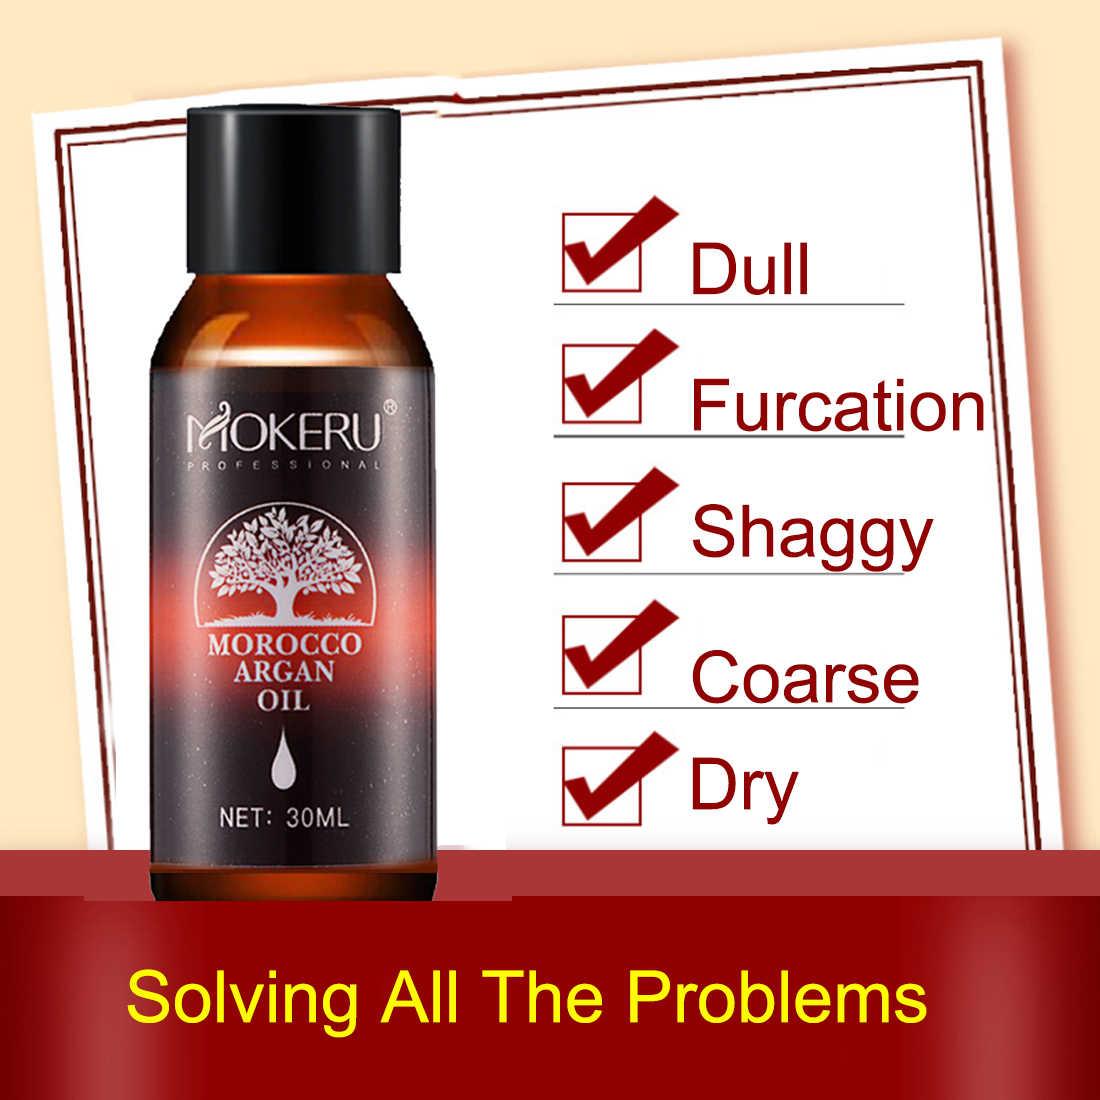 Mokeru 1 pc 30 ミリリットル天然有機髪血清平滑化のための乾燥した髪モロッコアルガンオイル治療エッセンシャルオイル成長ケア